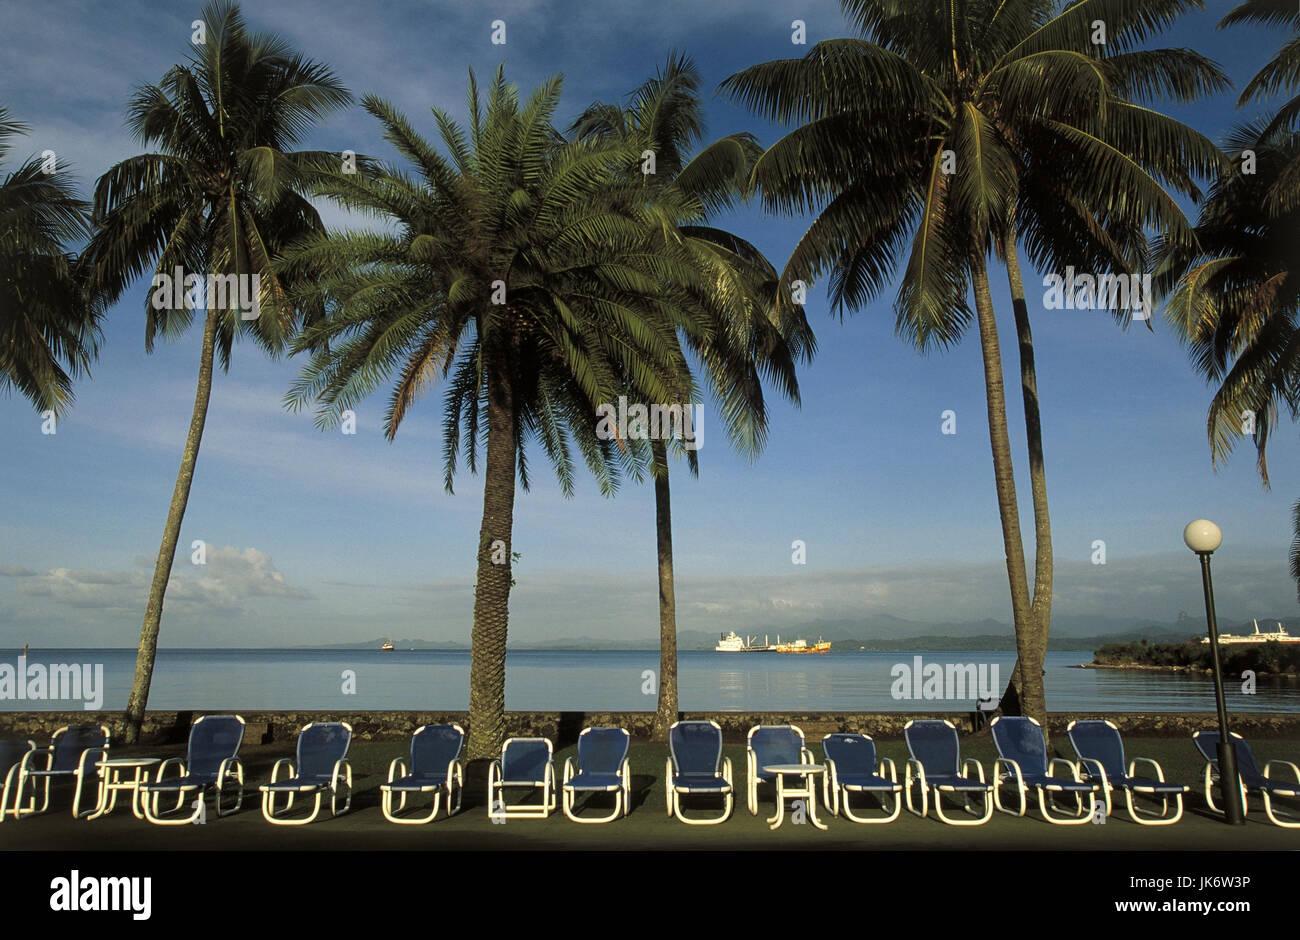 Fidschi Inseln, Viti Levu, Suva, Hotelstrand, Blick, Meer  Südsee, Insel, Strand, Liegewiese, Liegestühle,  Tourismus, Stock Photo